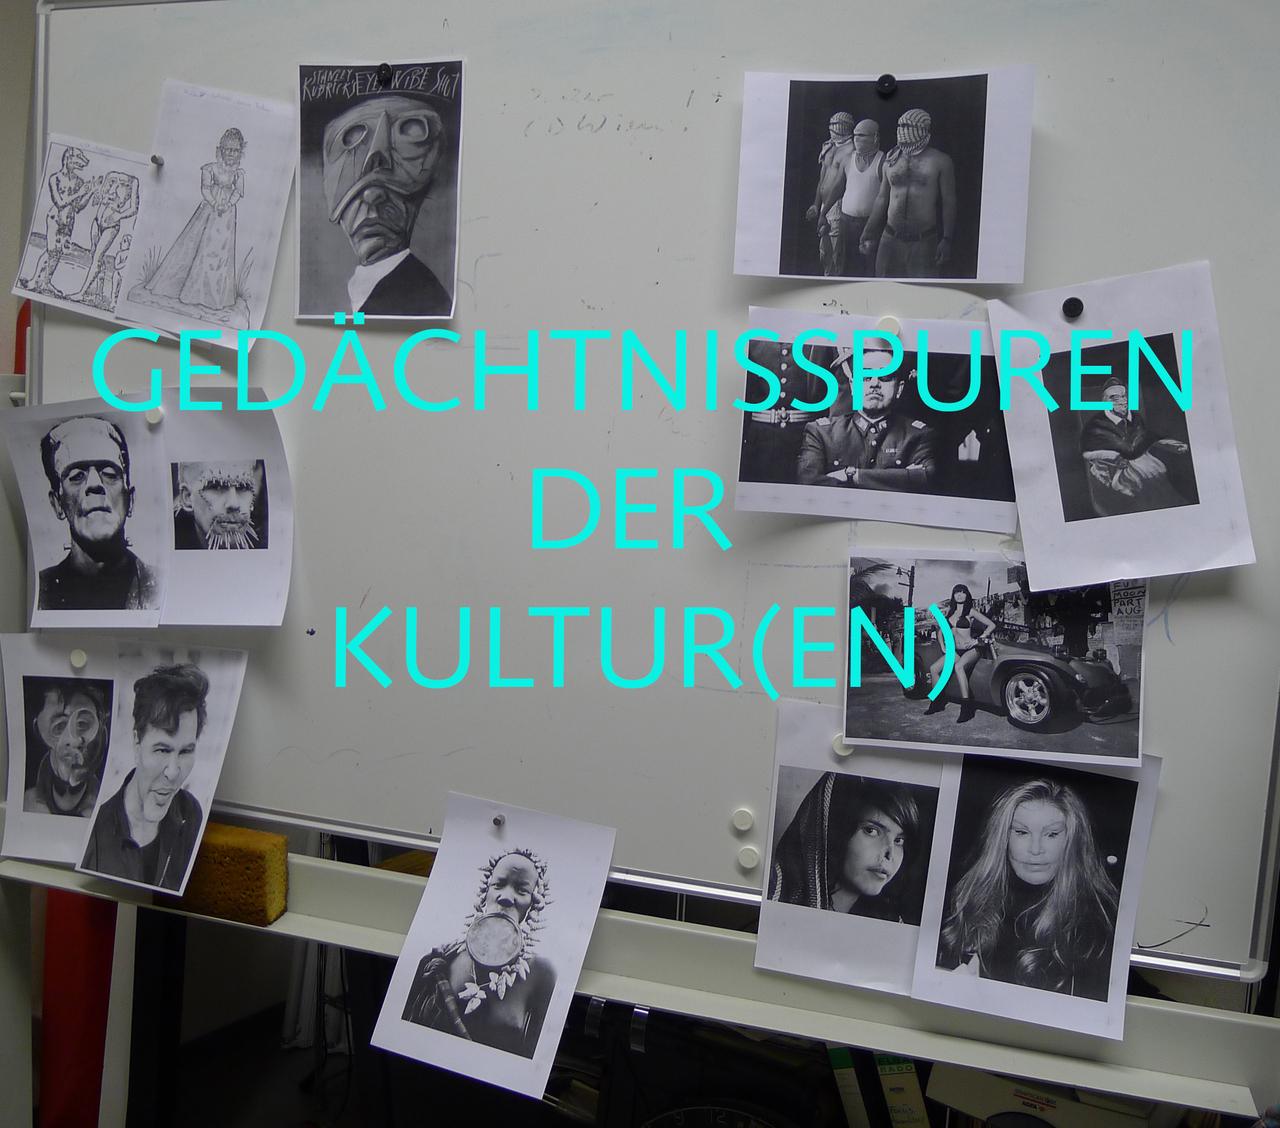 GEDÄCHTNISSPUREN DER KULTUR(EN)